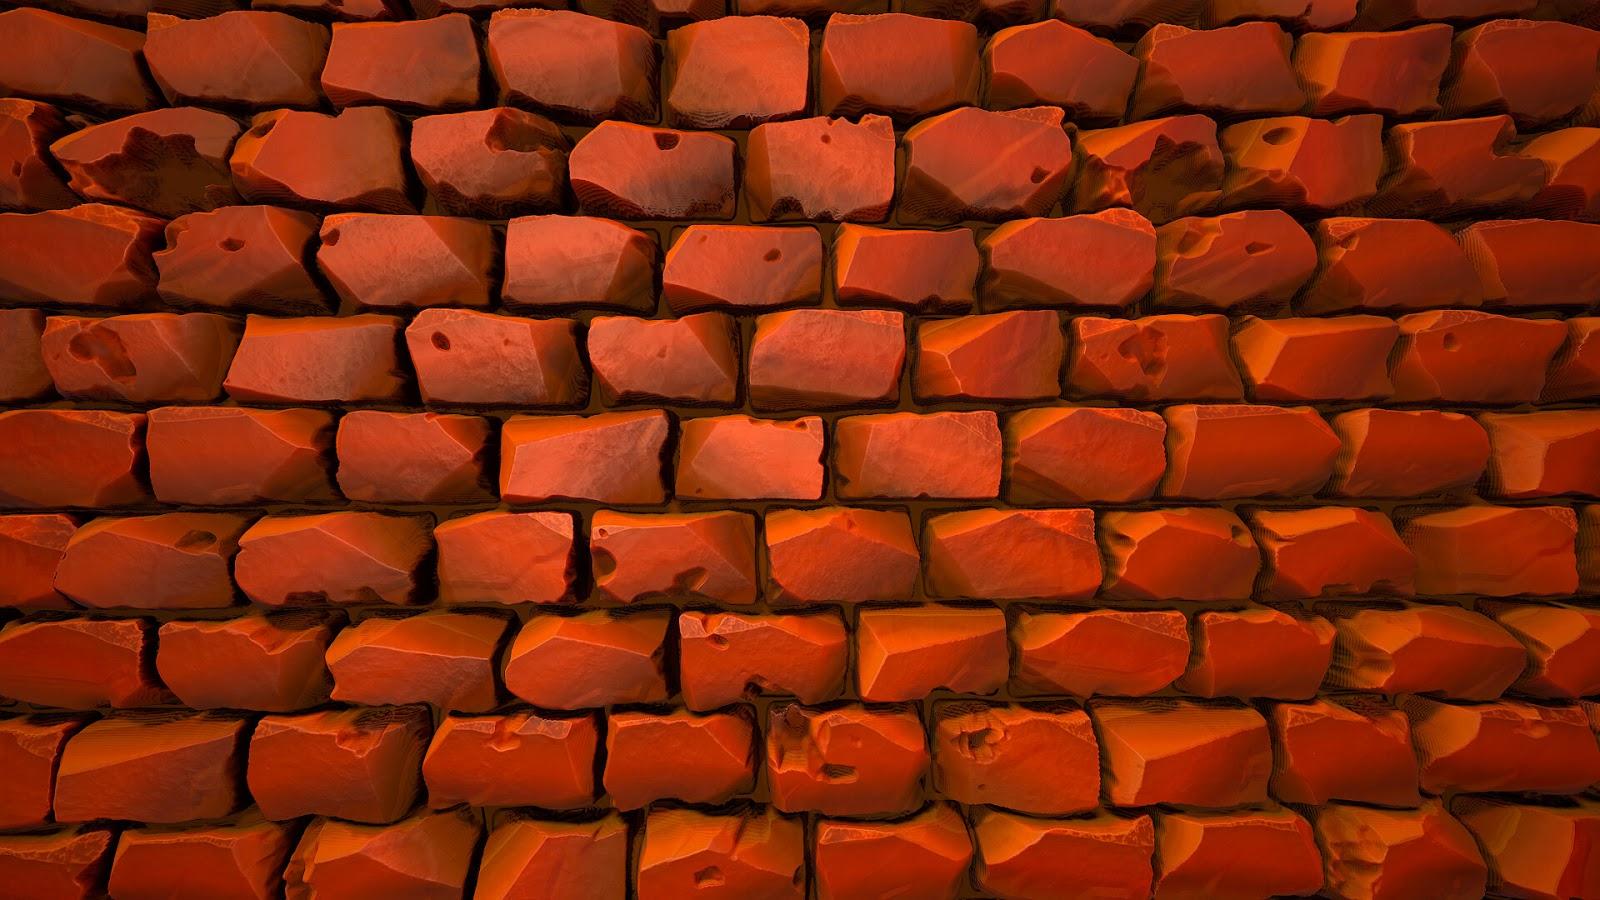 Bricks illustration to use as desktop wallpaper 1080 pixels